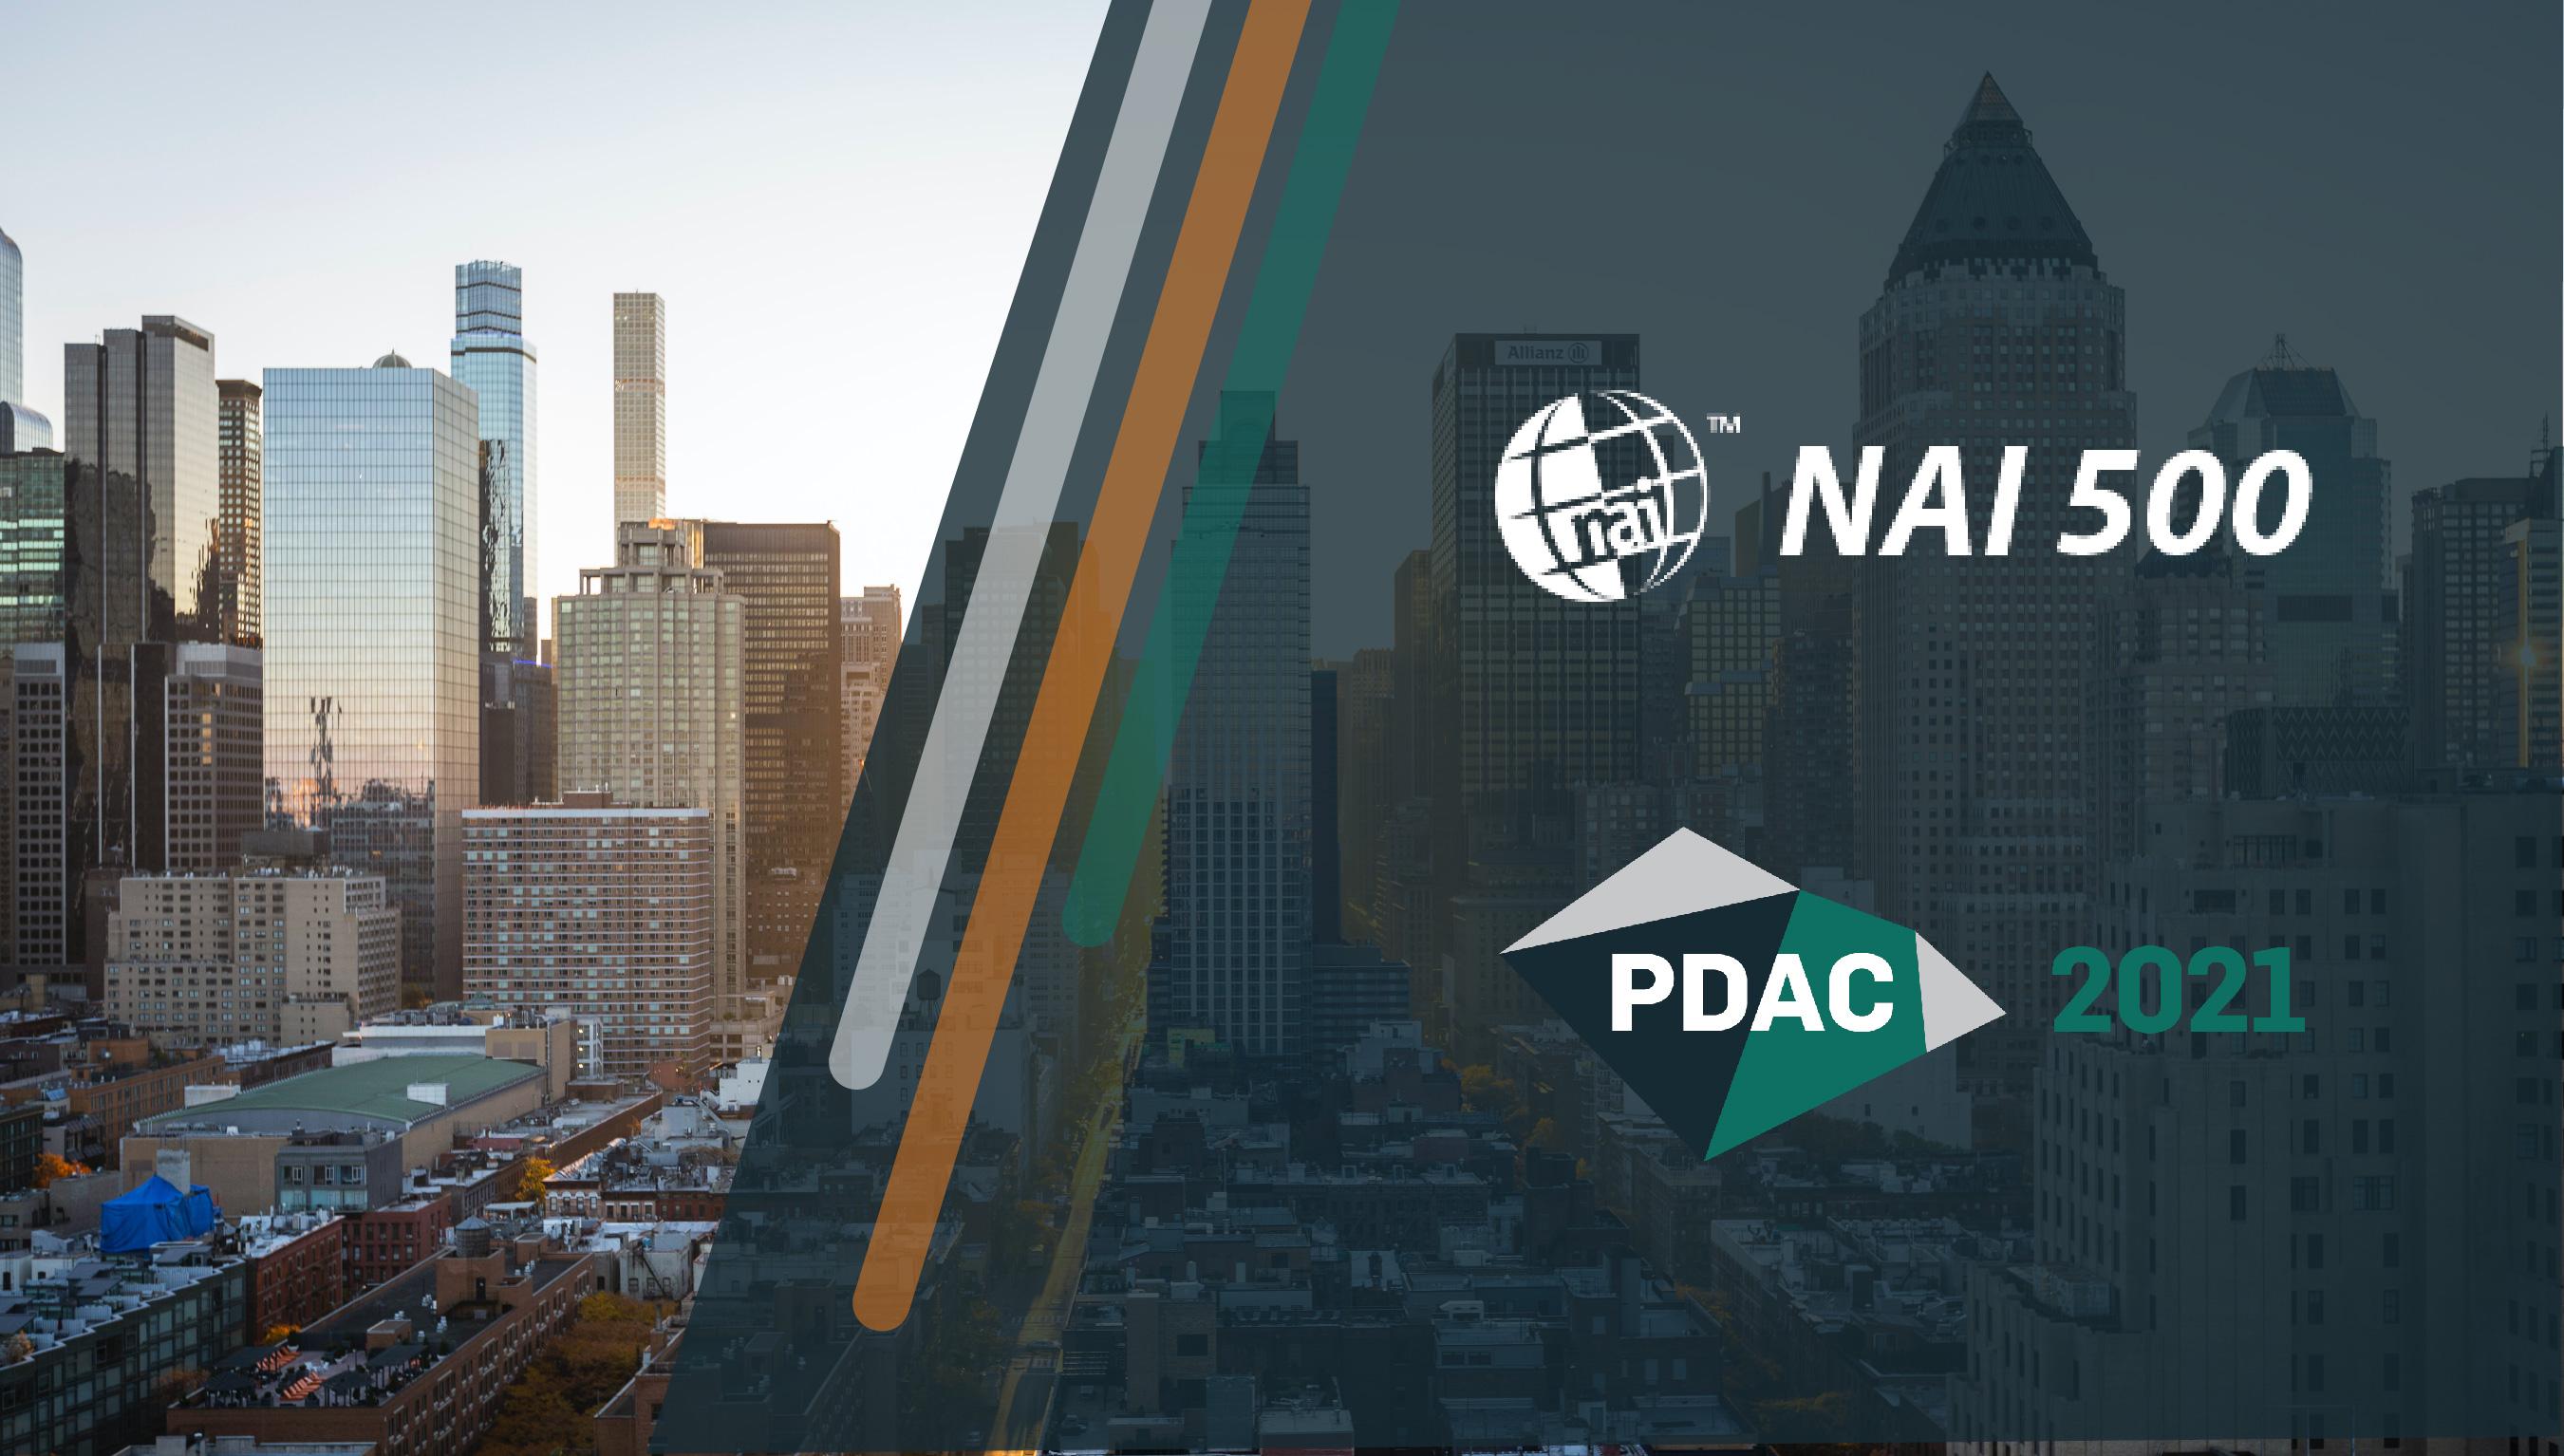 PDAC 2021